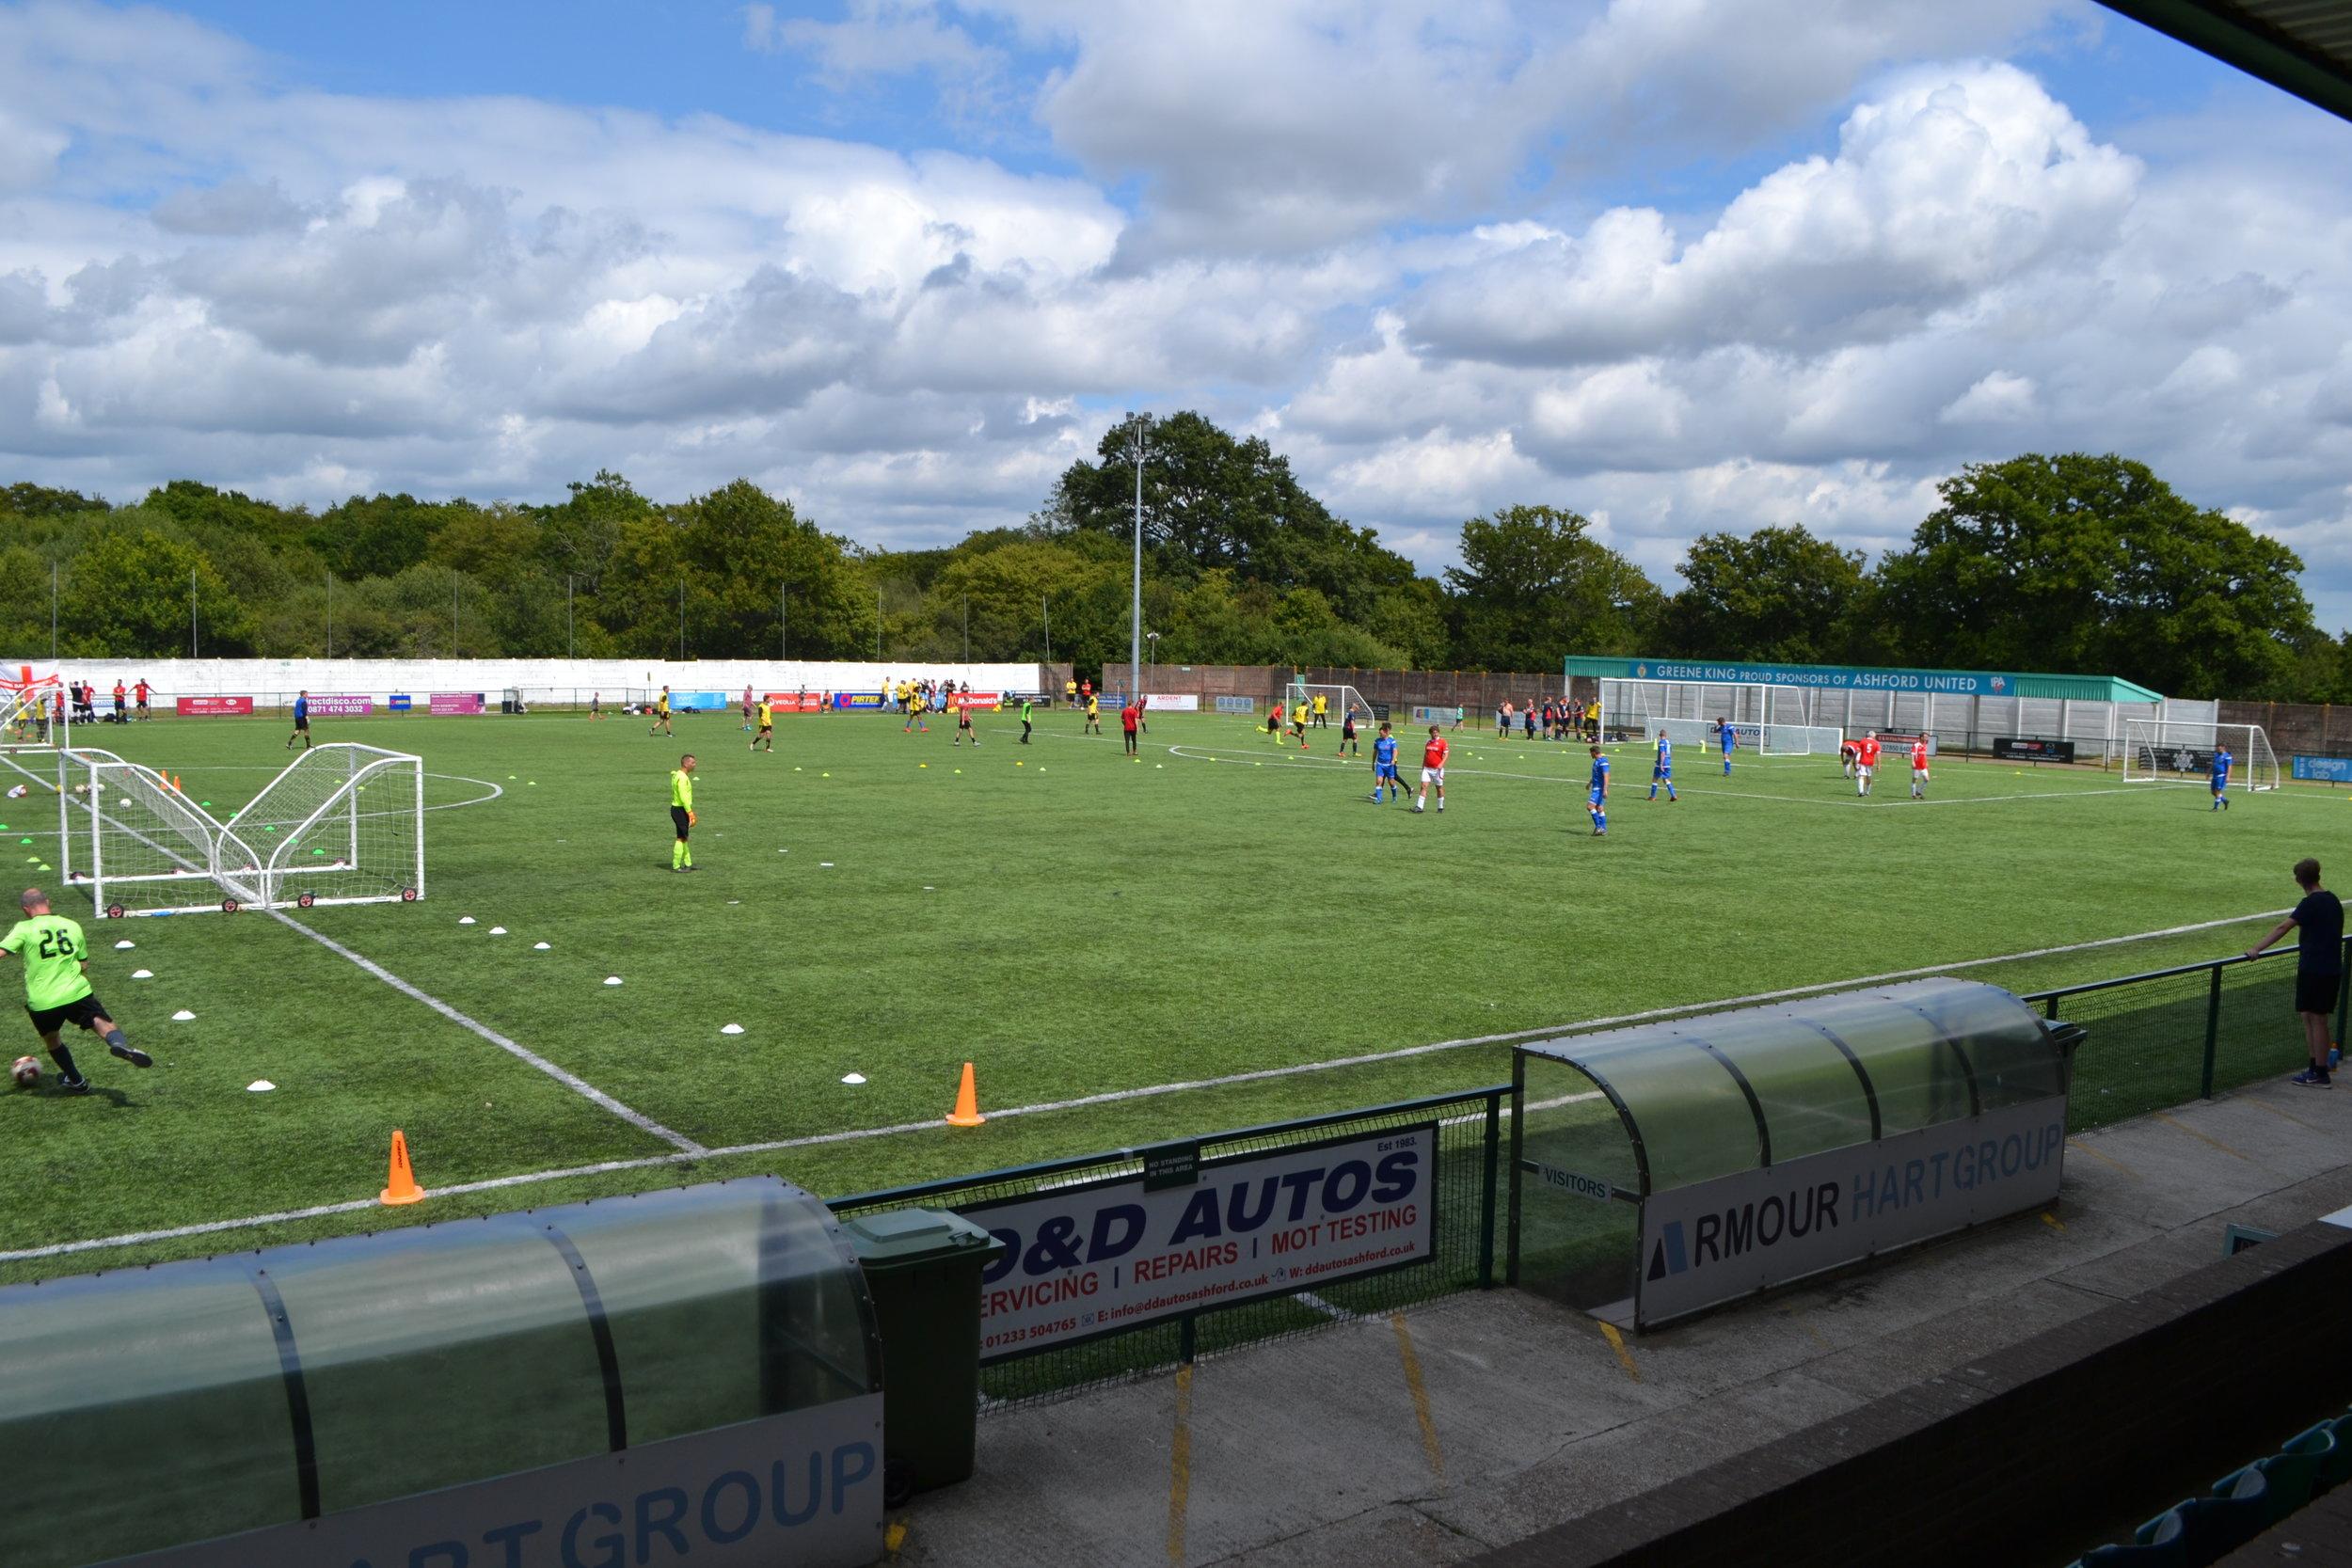 ASHFORD MONDAY - VENUE: Homelands (Ashford United FC)TIME: 8.00pm - 9.30pmCOST: £30.00 per Team per WeekLEAGUE MANAGER: Dan O'Donoghue